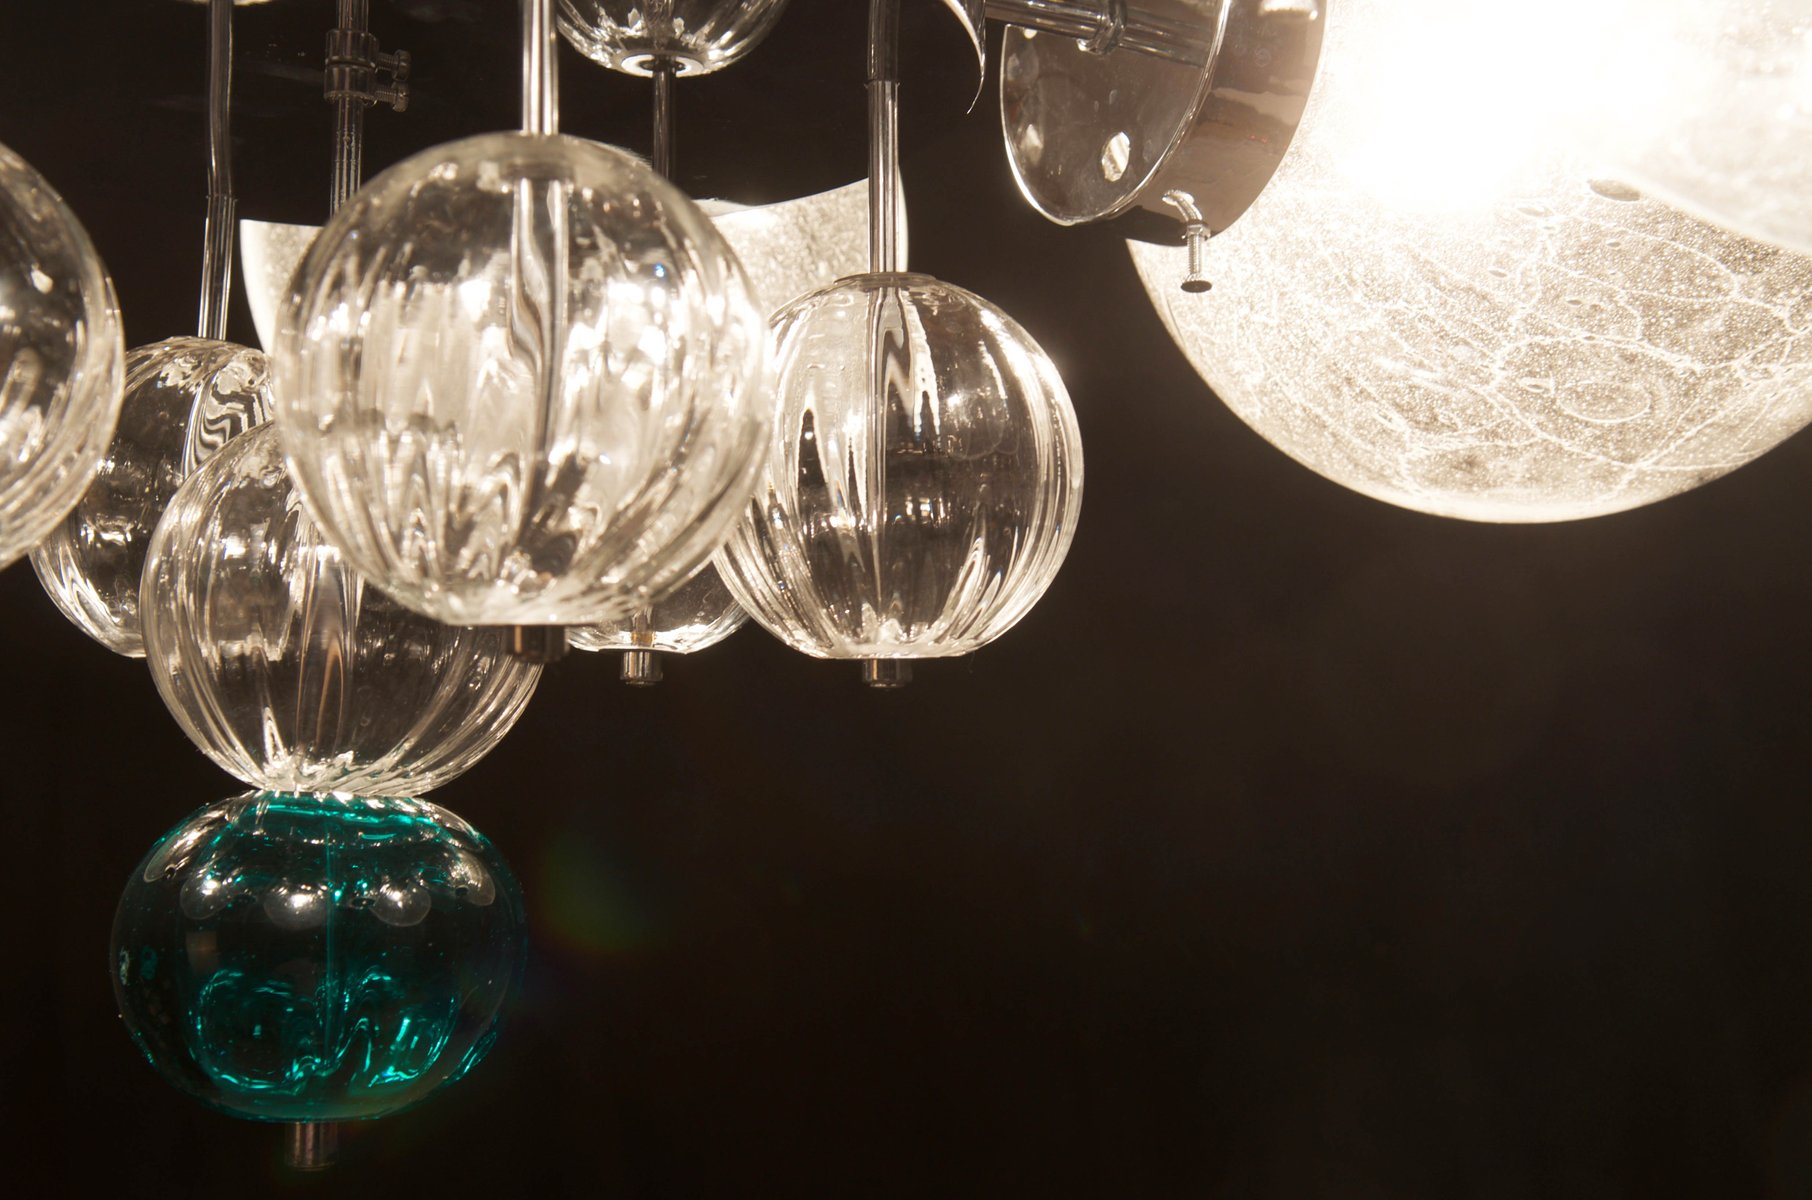 Chandelier with Handblown Glass Globes from Kamenicky Senov